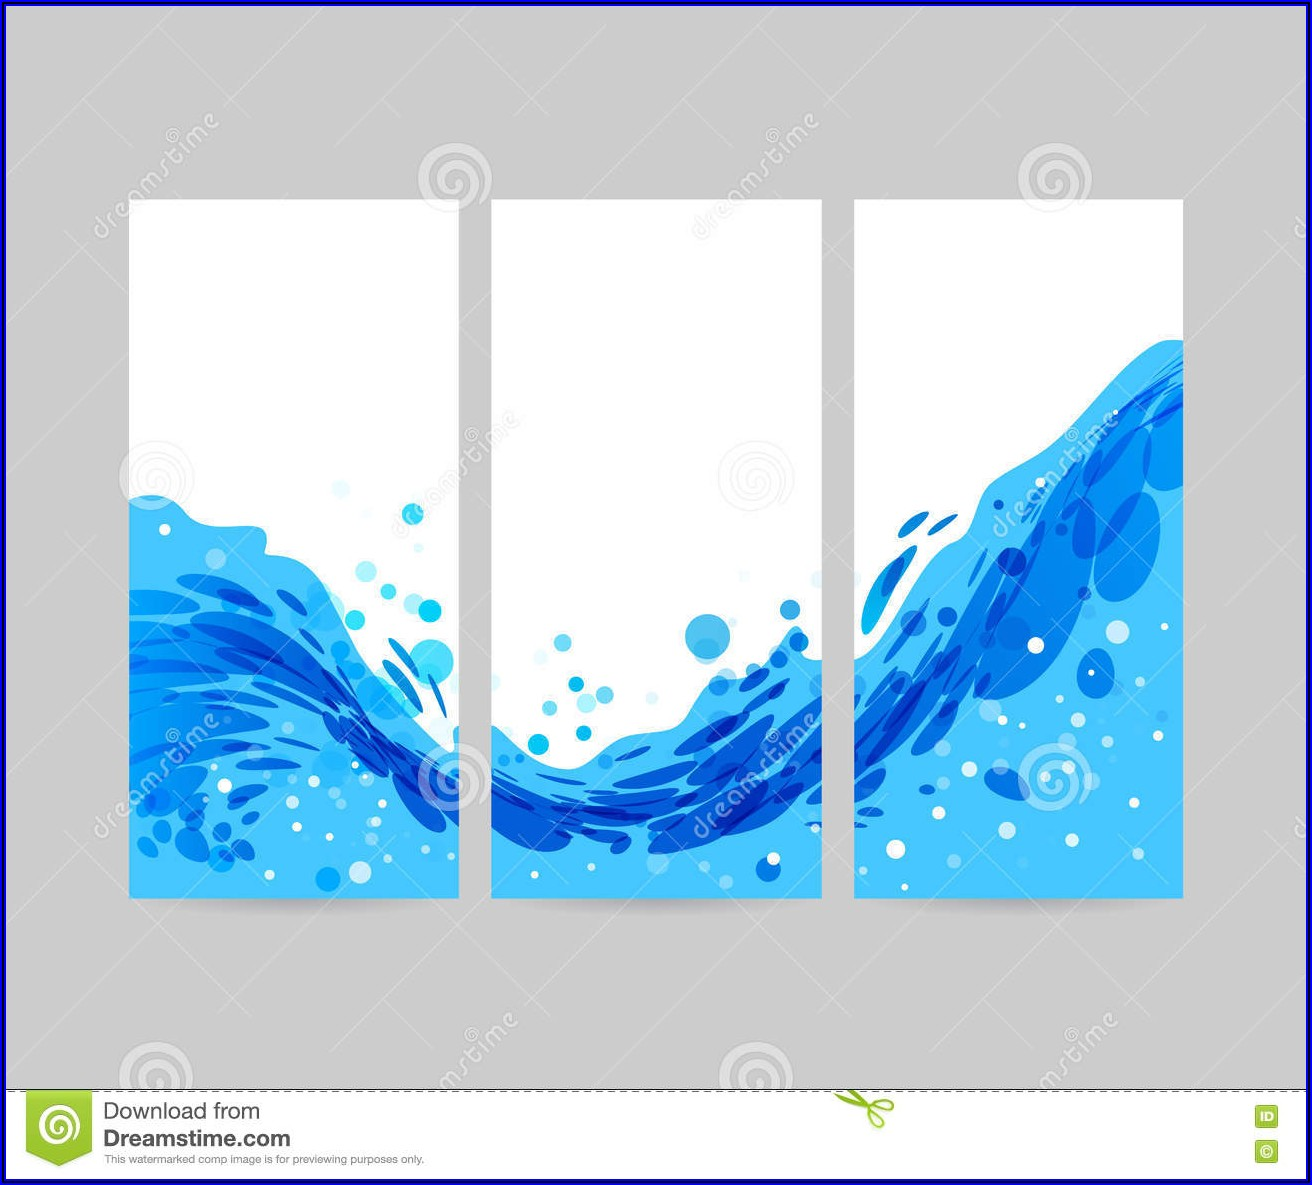 Tri Fold Brochure Background Design Free